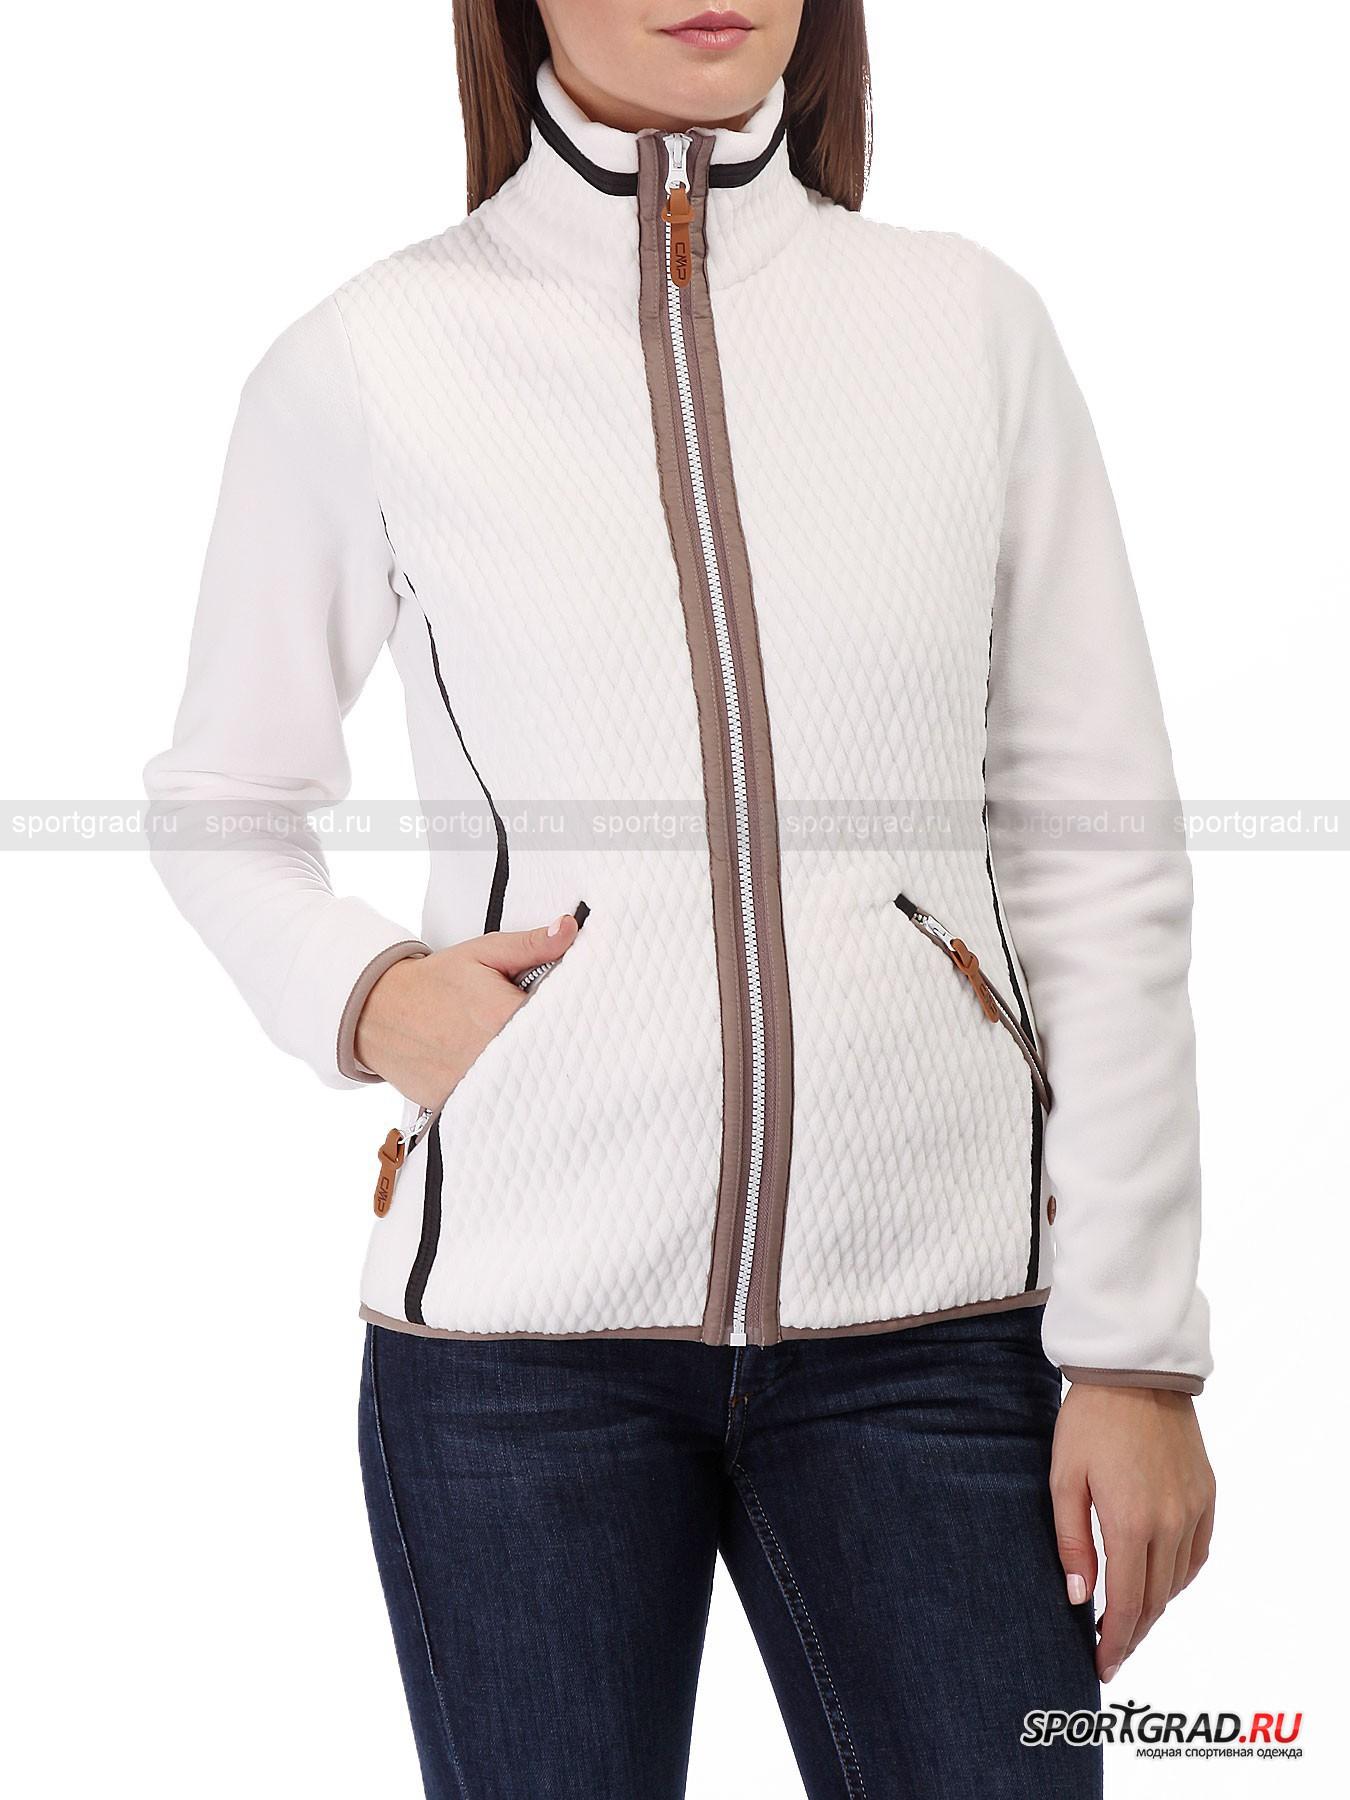 Толстовка женская Woman Fleece Jacket CAMPAGNOLO